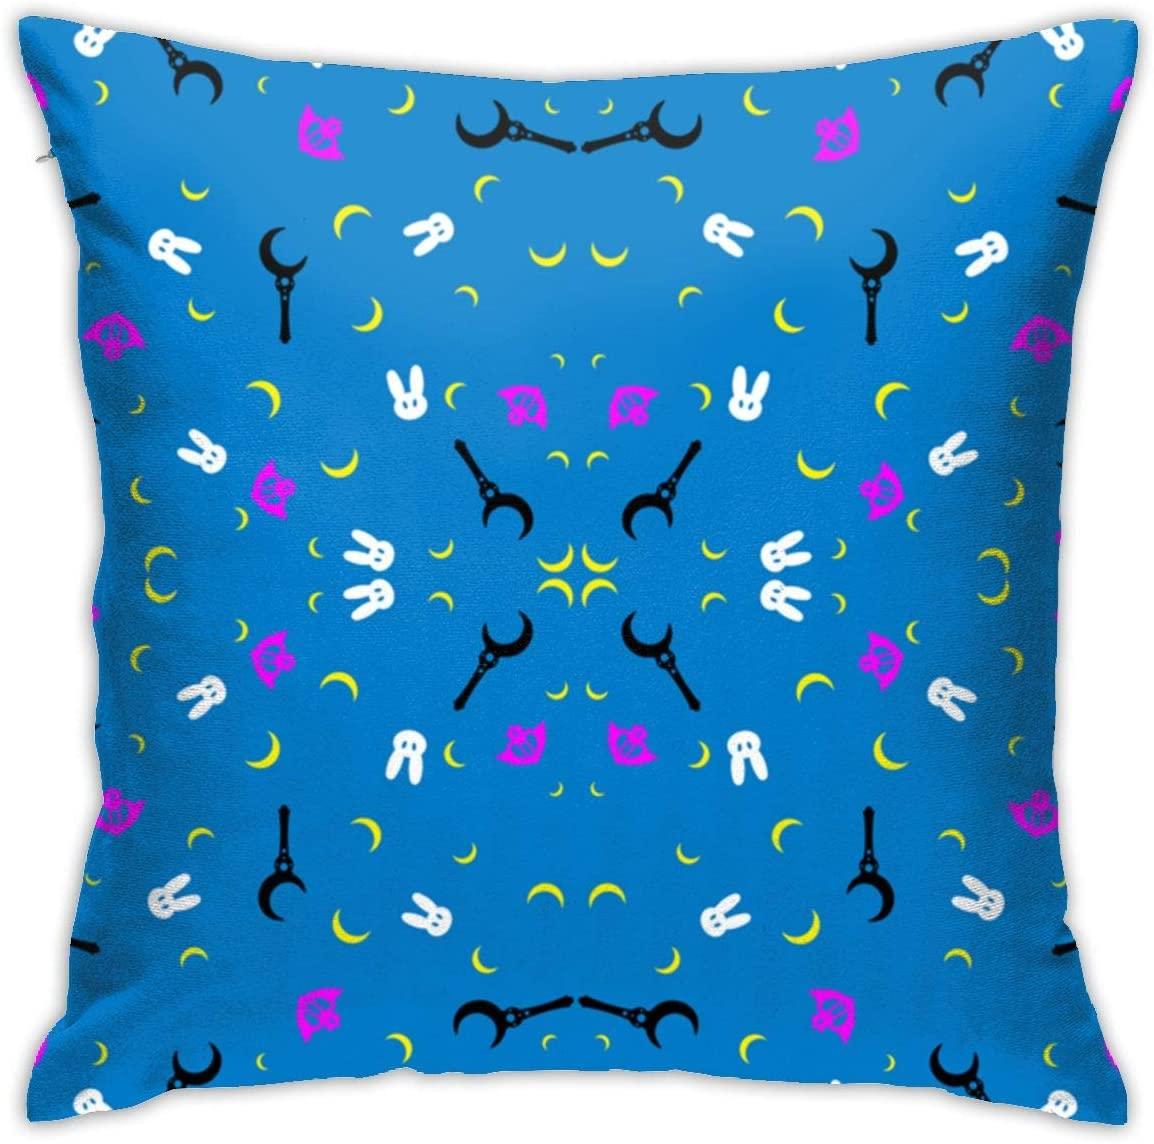 antkondnm Sailor Moon Square Pillowcase for Sofa Bed or Car Soft Throw Pillow Cover, Decorative Pillowslip